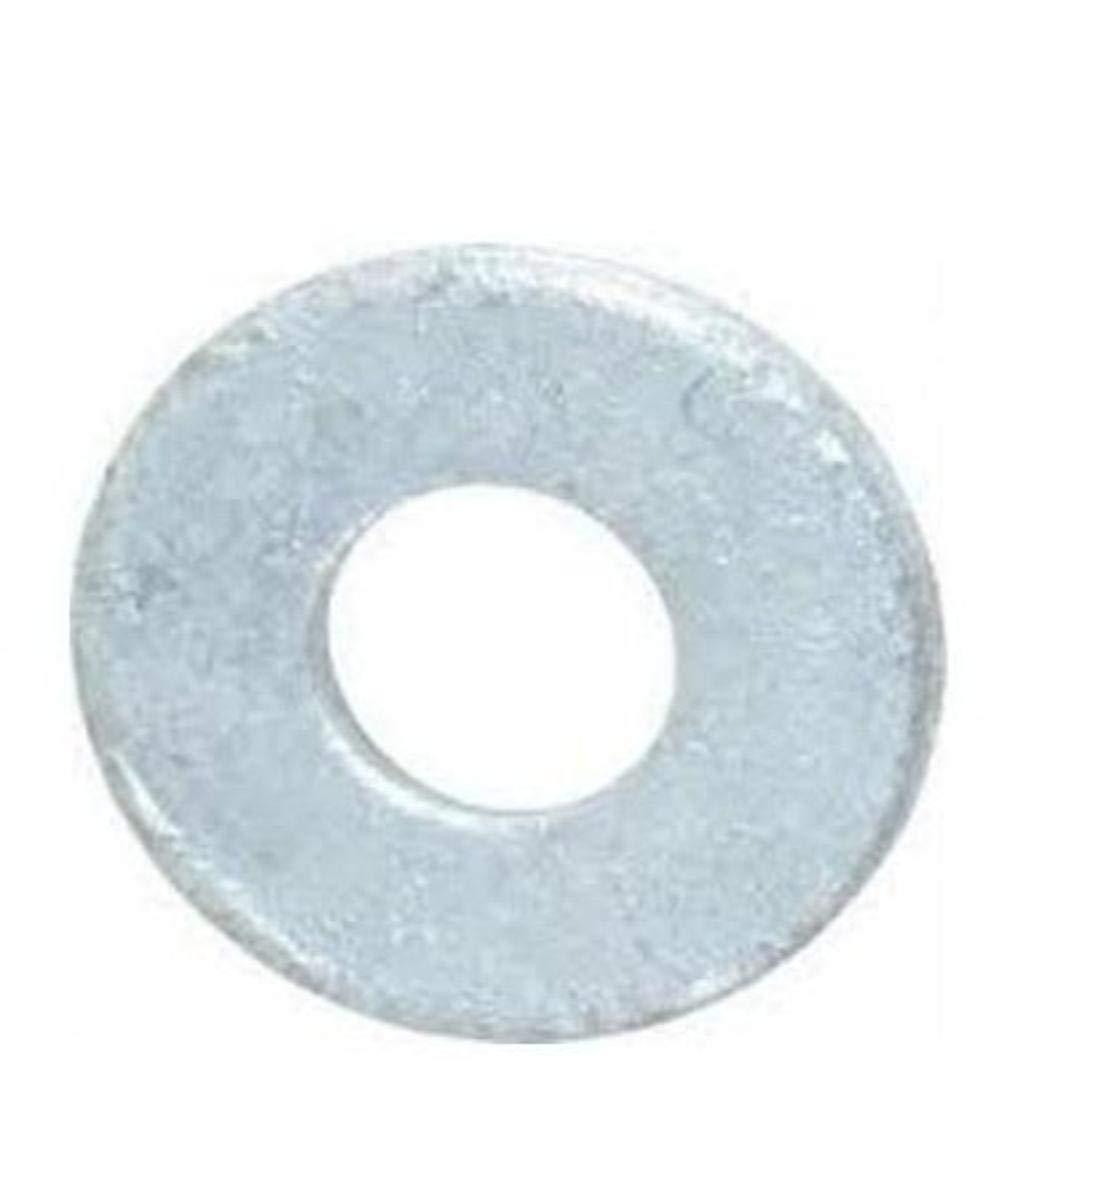 Steel Flat Washer, Hot-Dipped Galvanized Finish, ASME B18.22.1, 5/8